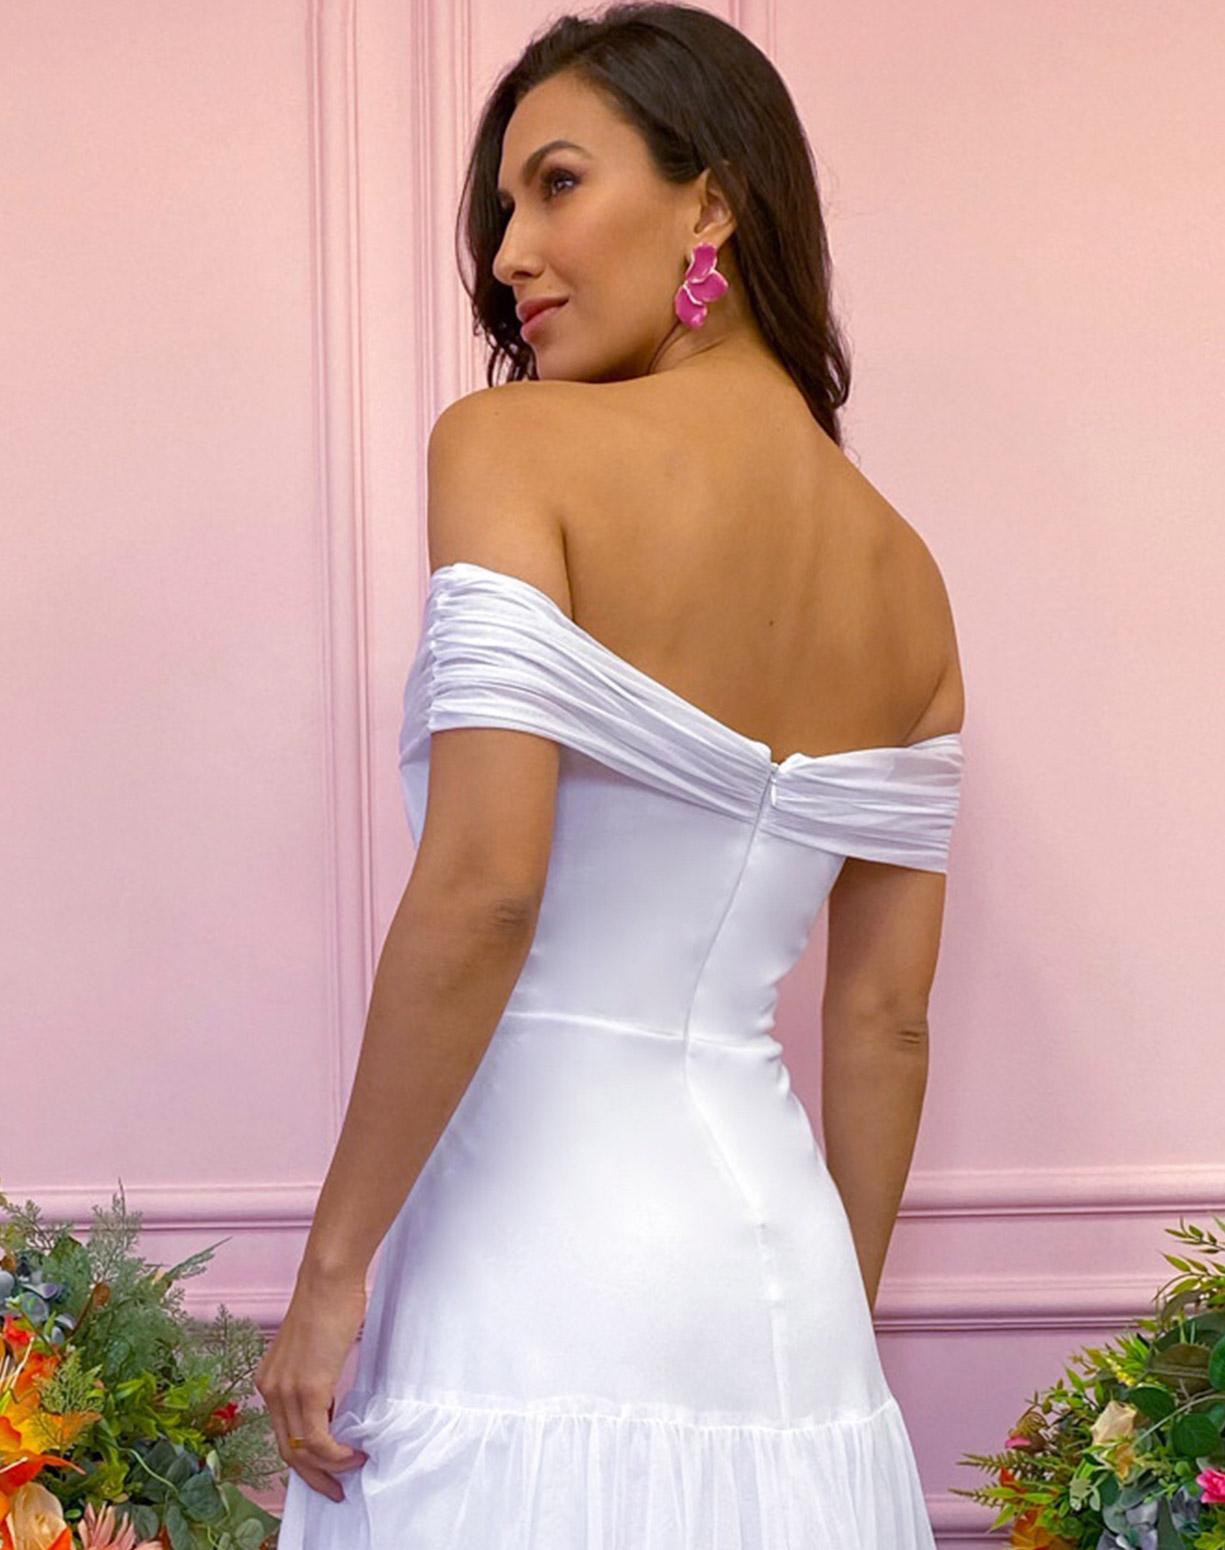 Vestido Branco em Tule com Decote Ombro a Ombro